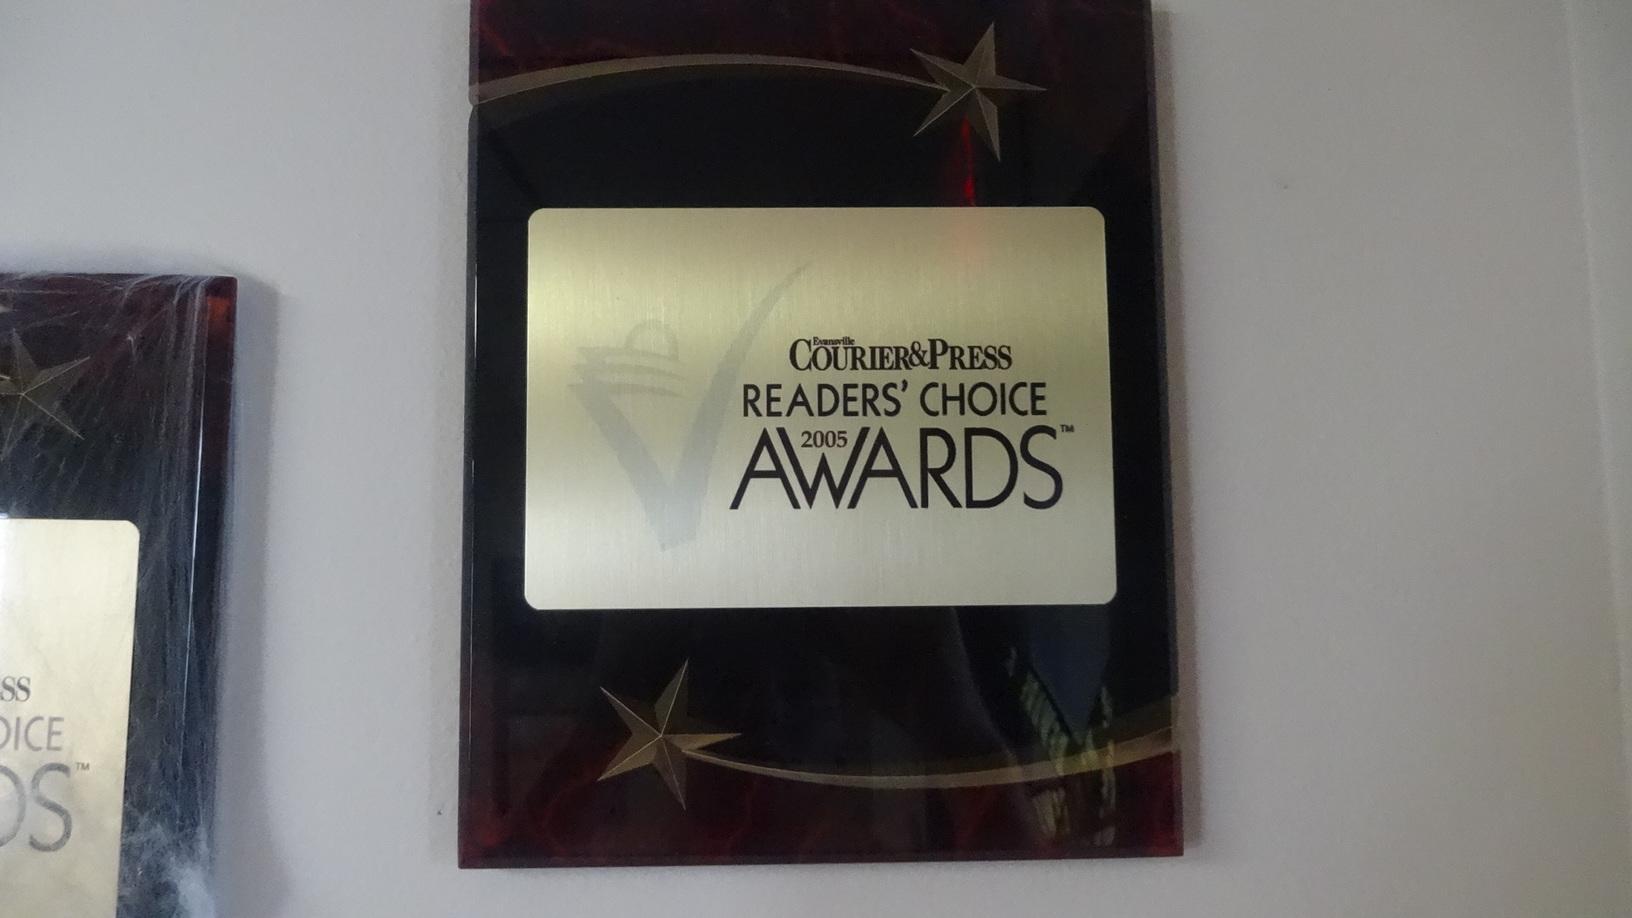 Reader's Choice Award 2005